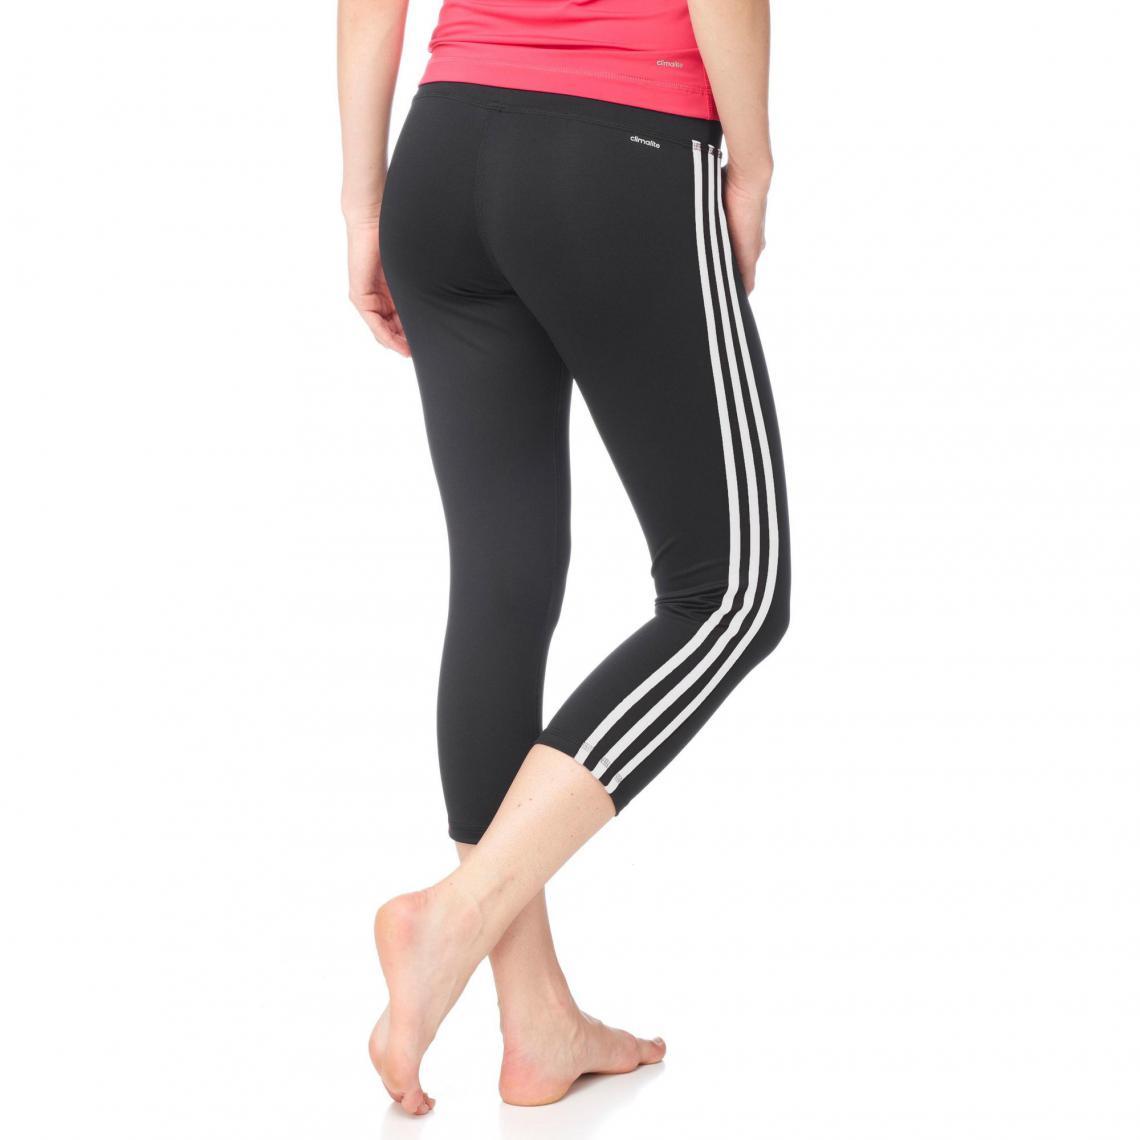 Pantalon legging 34 sport femme Climalite adidas - Noir  28f2c22fedc